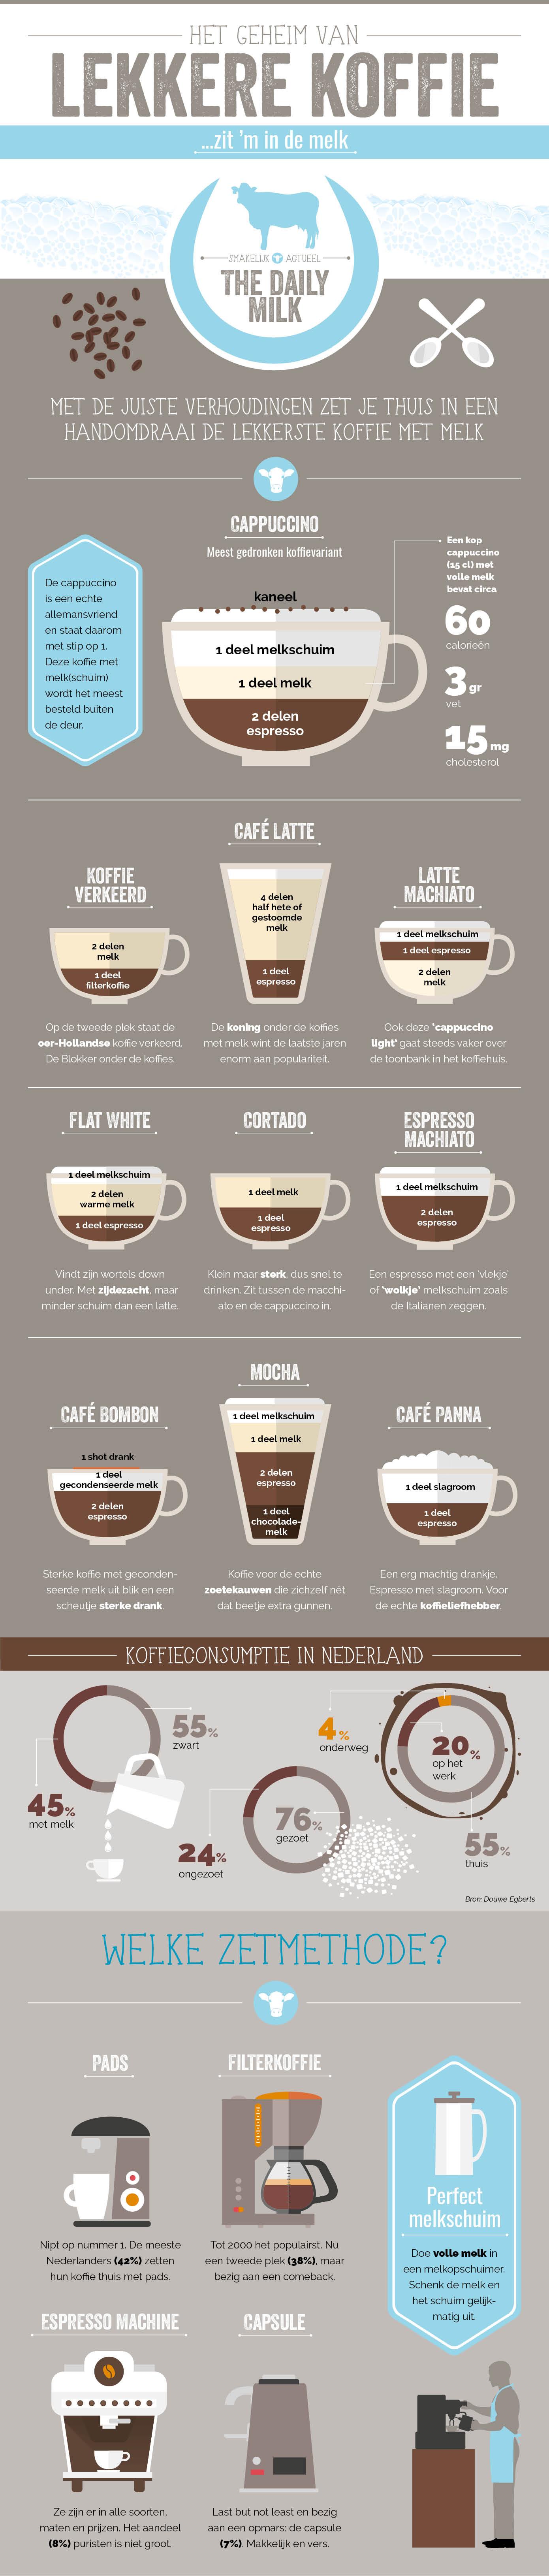 lekkere koffie melk